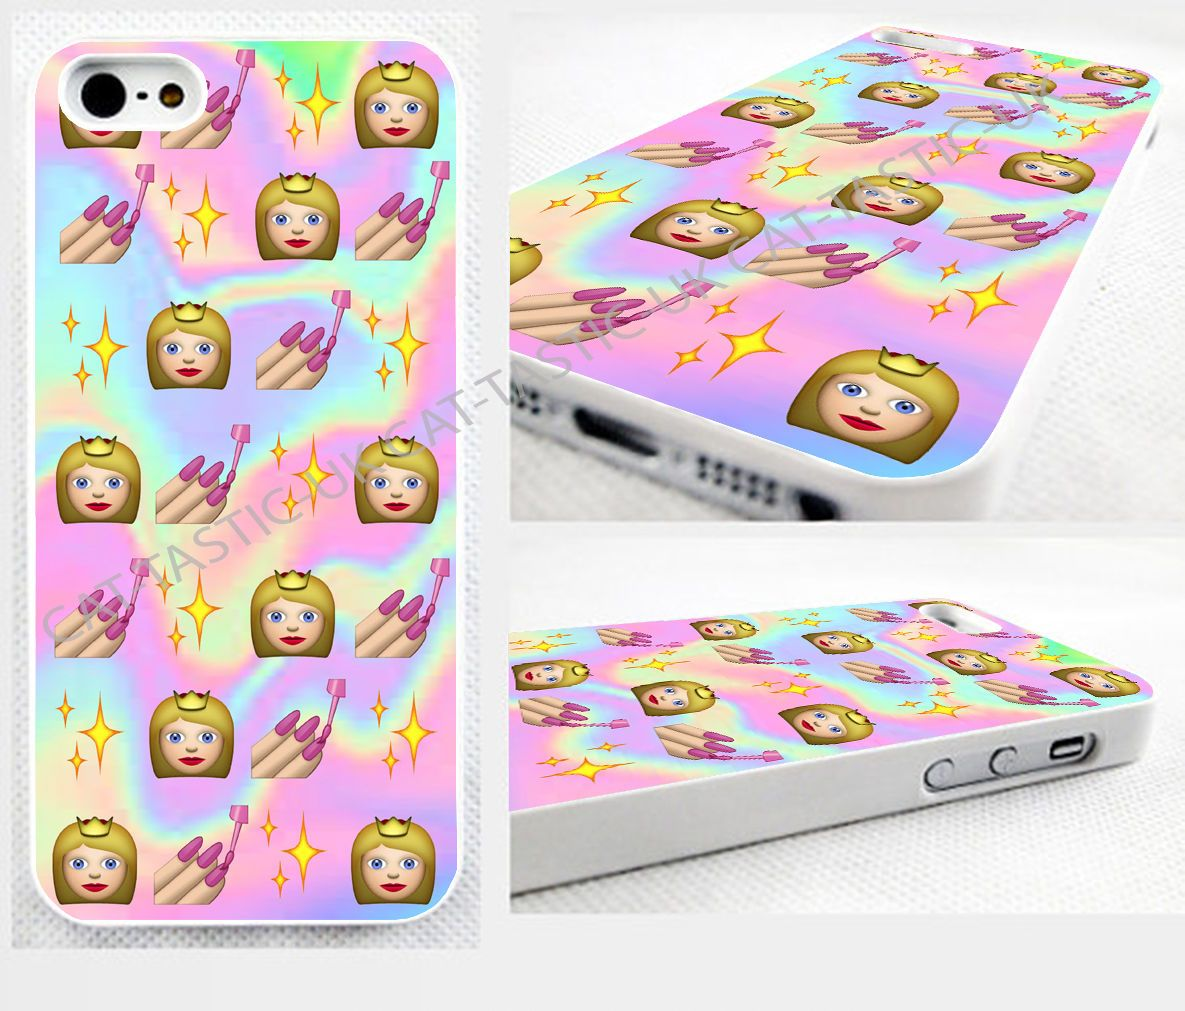 emoji emoticon thin case,cover,iPhone,iPod>Tie Dye